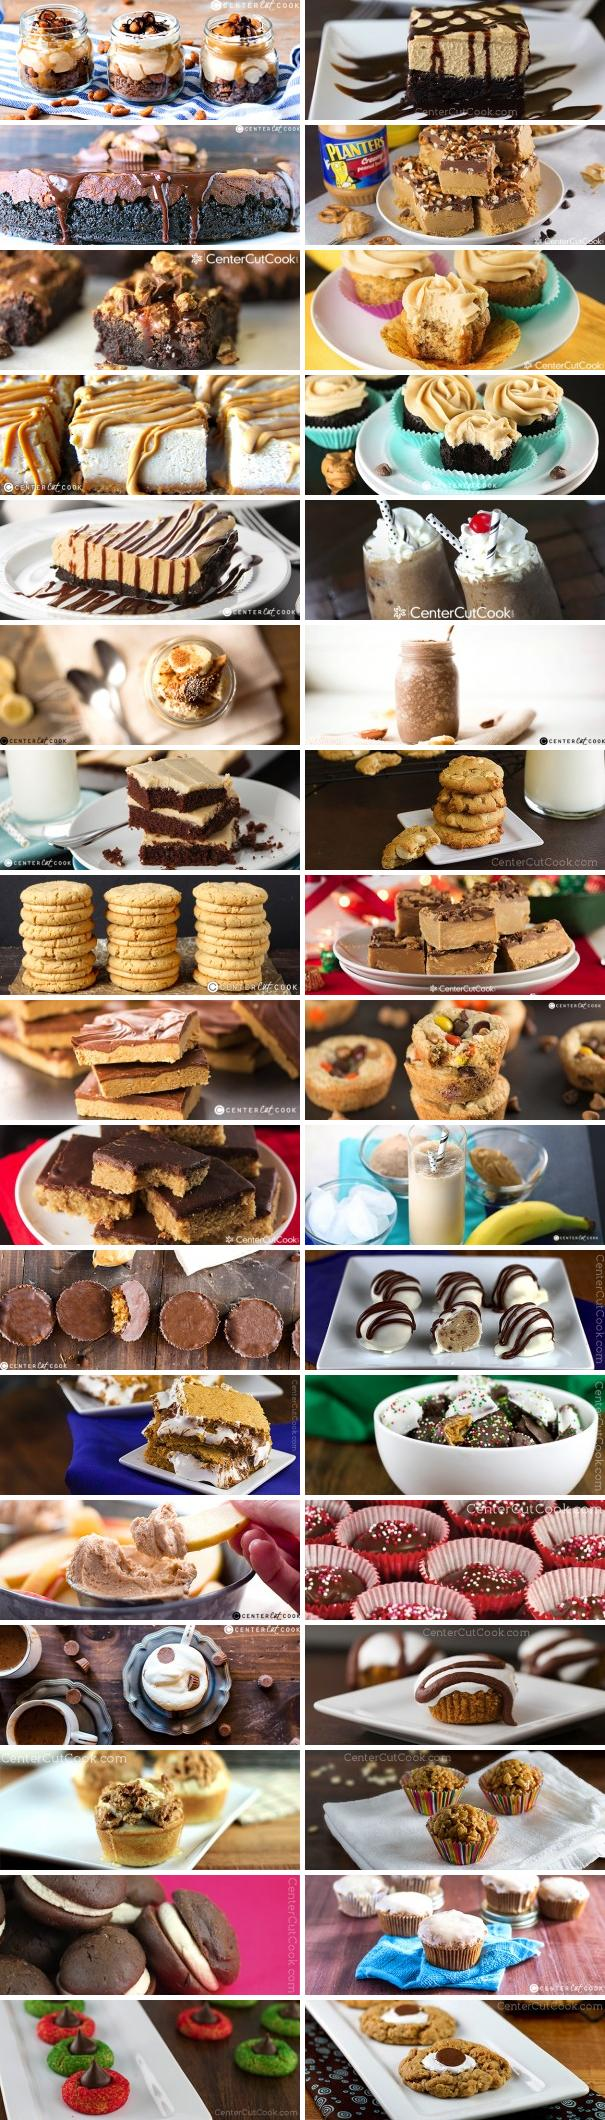 Best Peanut Butter Desserts